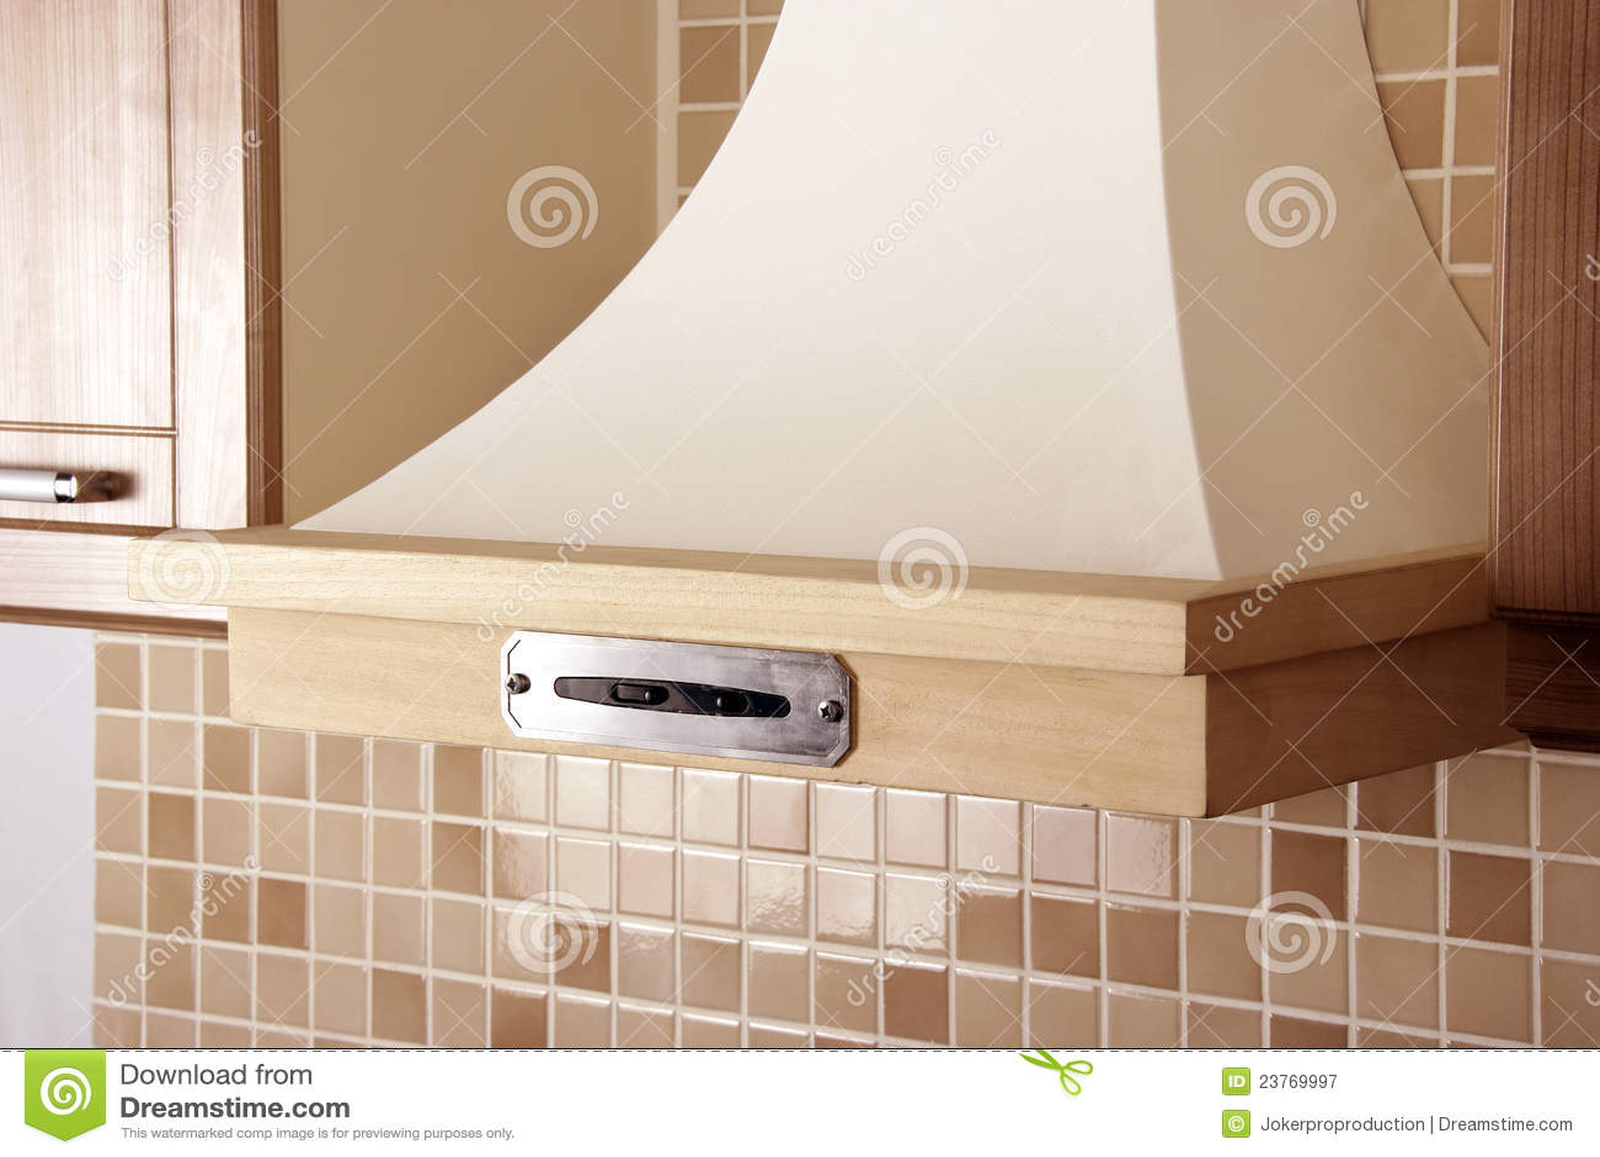 aspiratore per la cucina moderna immagine stock immagine